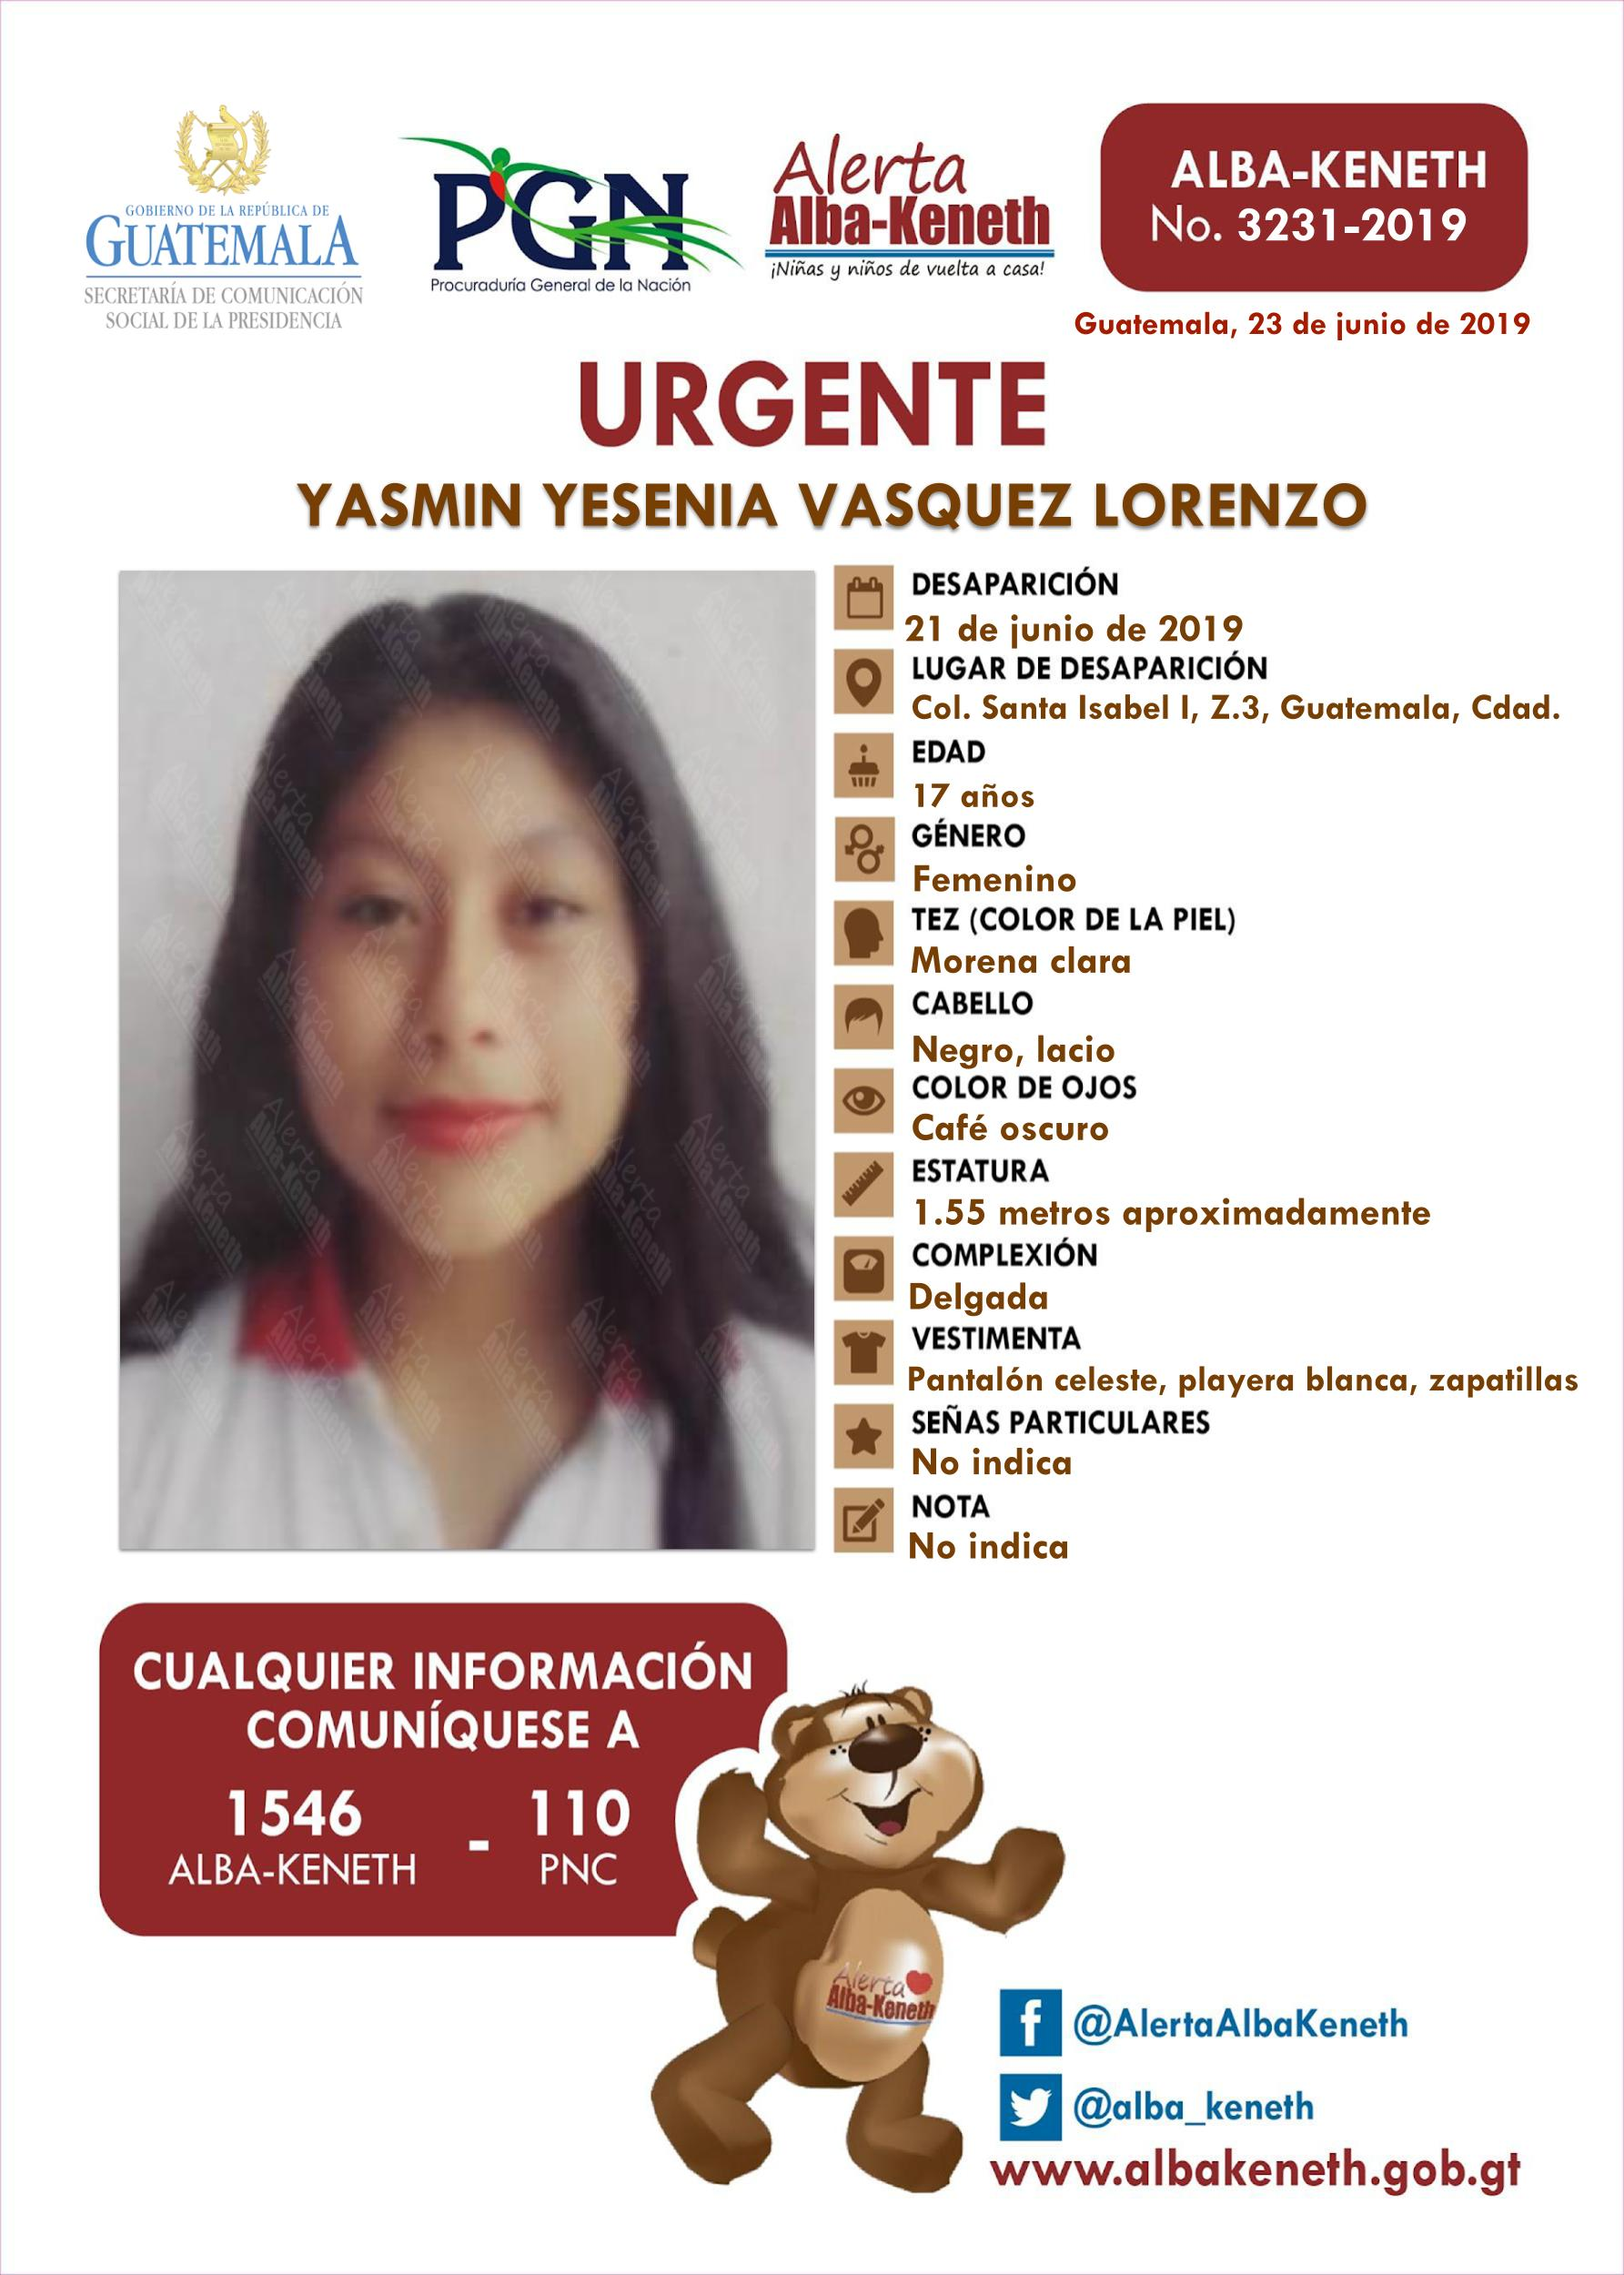 Yasmin Yesenia Vasquez Lorenzo